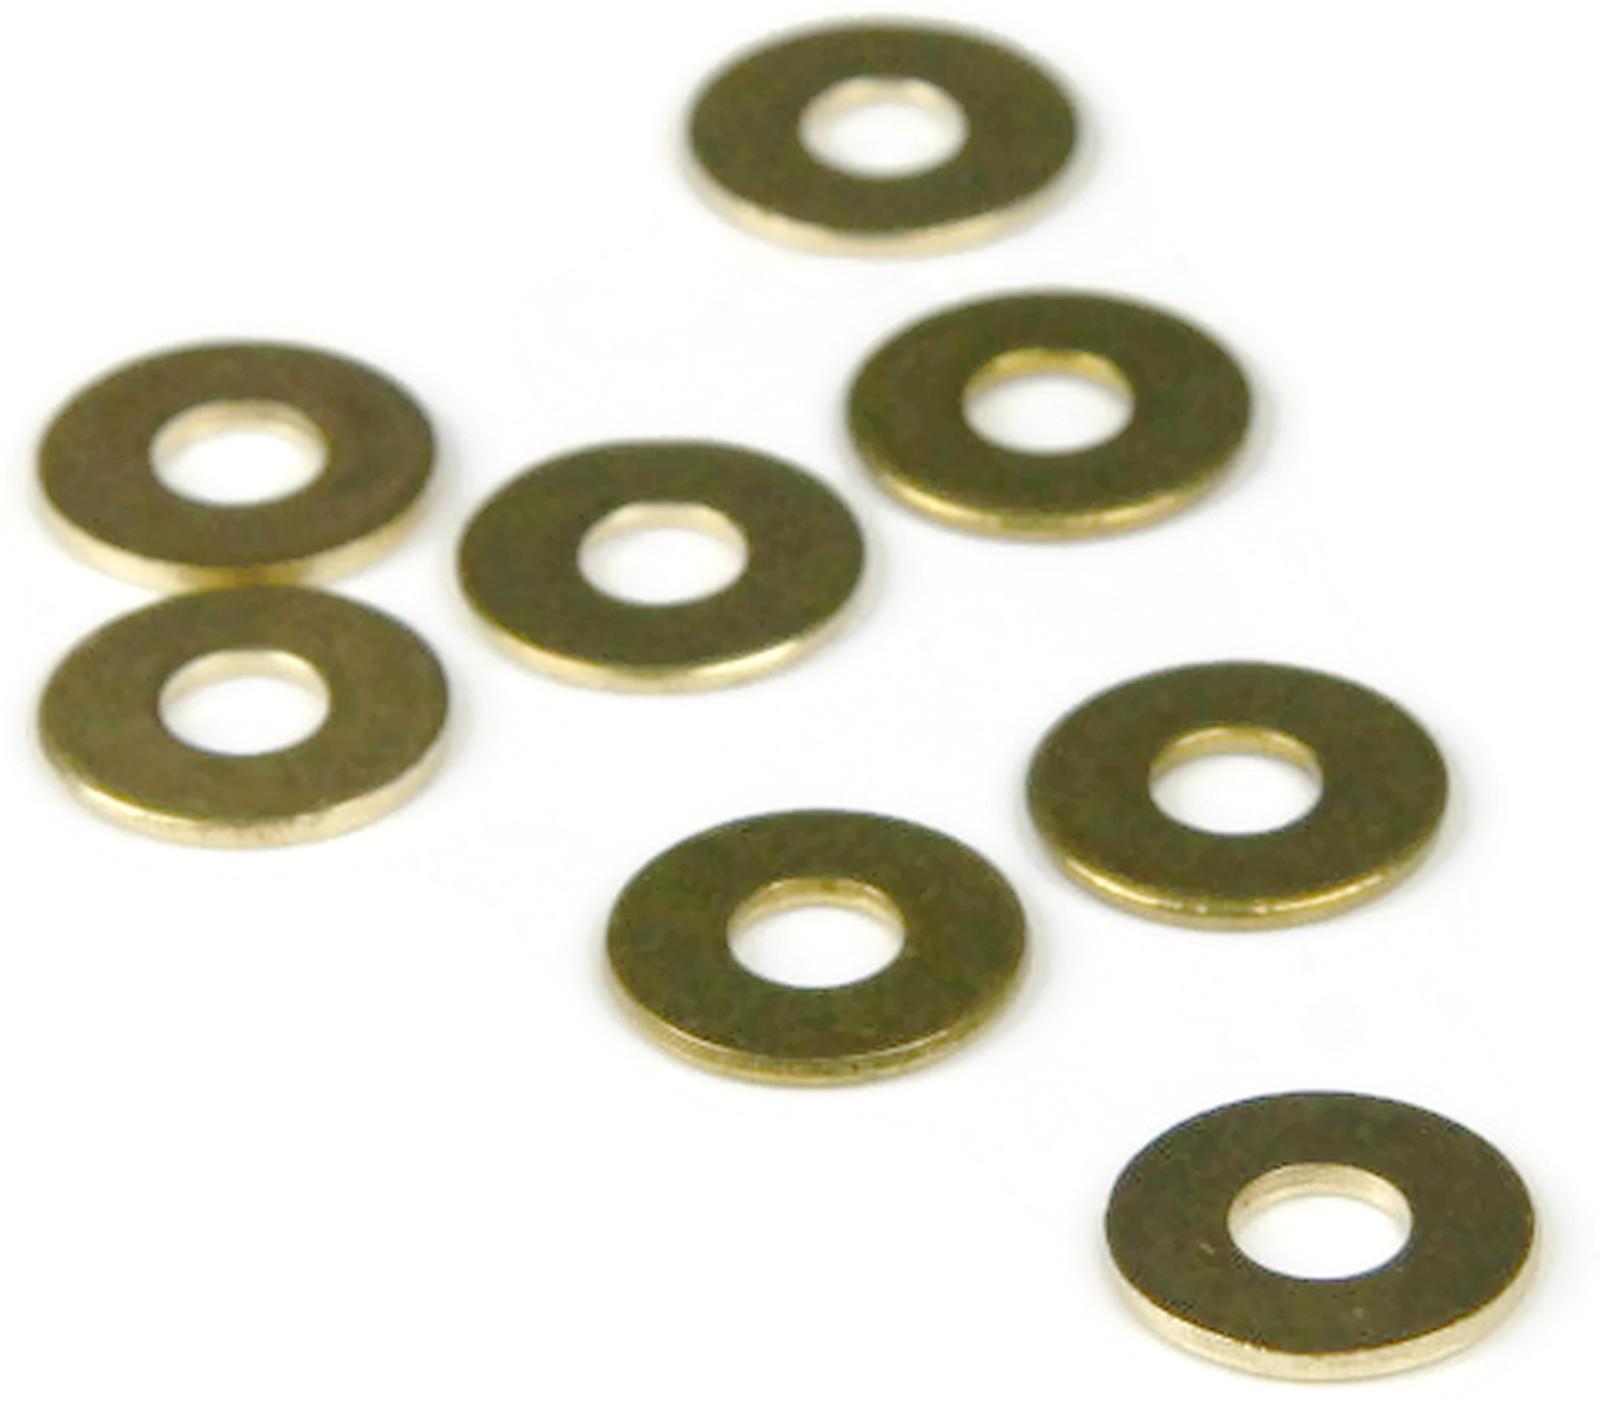 Brass Flat Washer #2 Qty 250